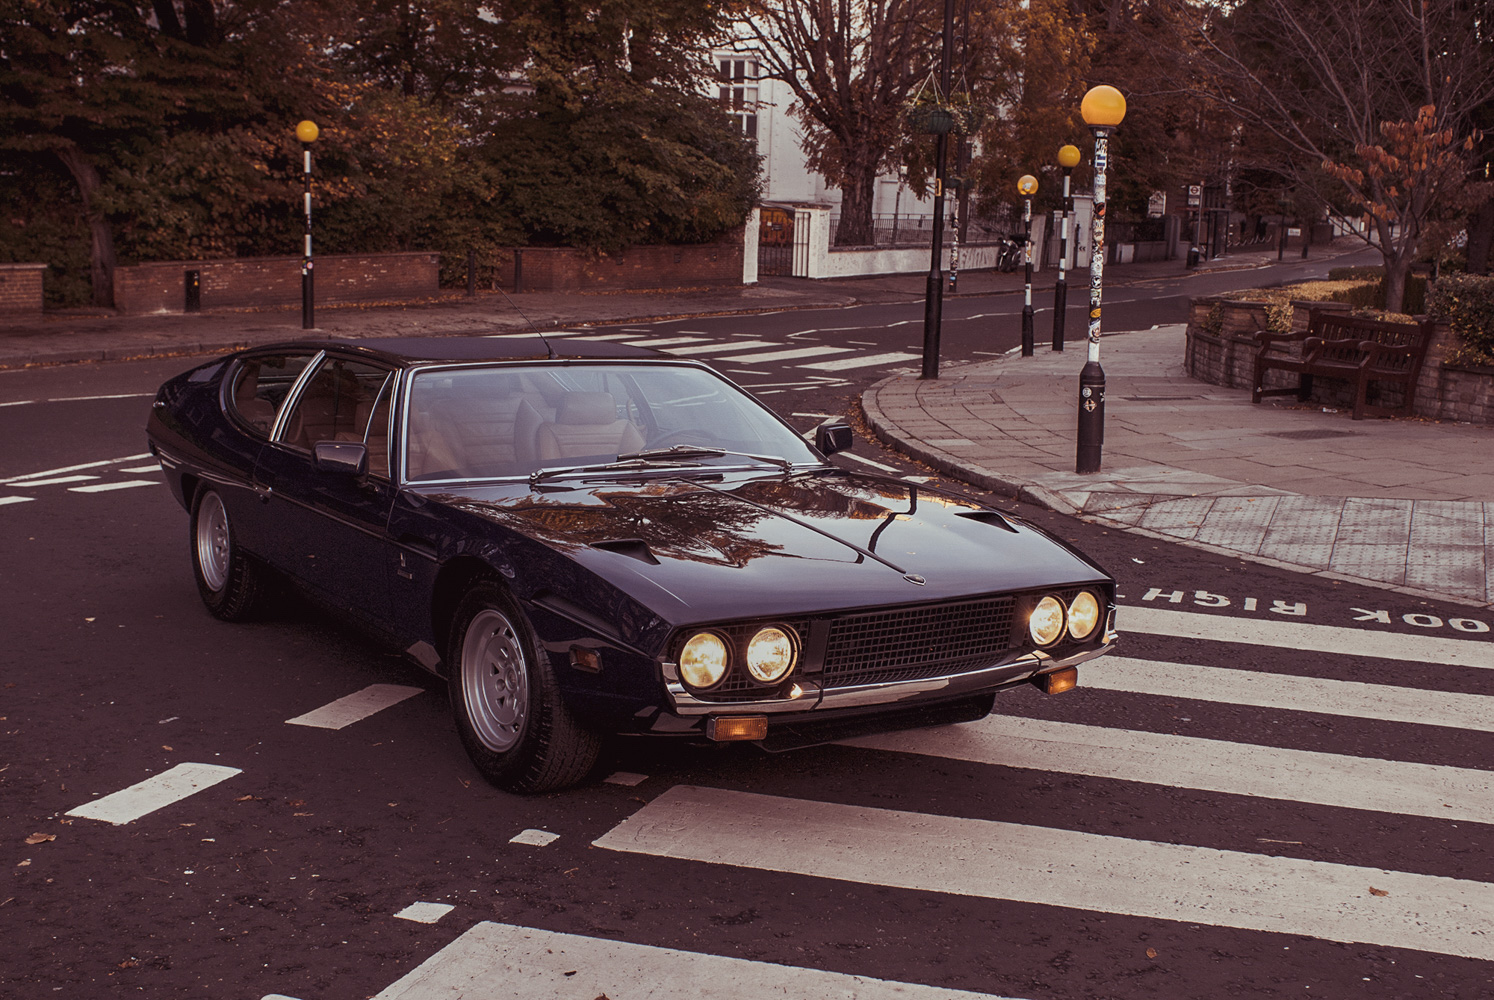 Lamborghini espada Abbey road beetles 3/4 front